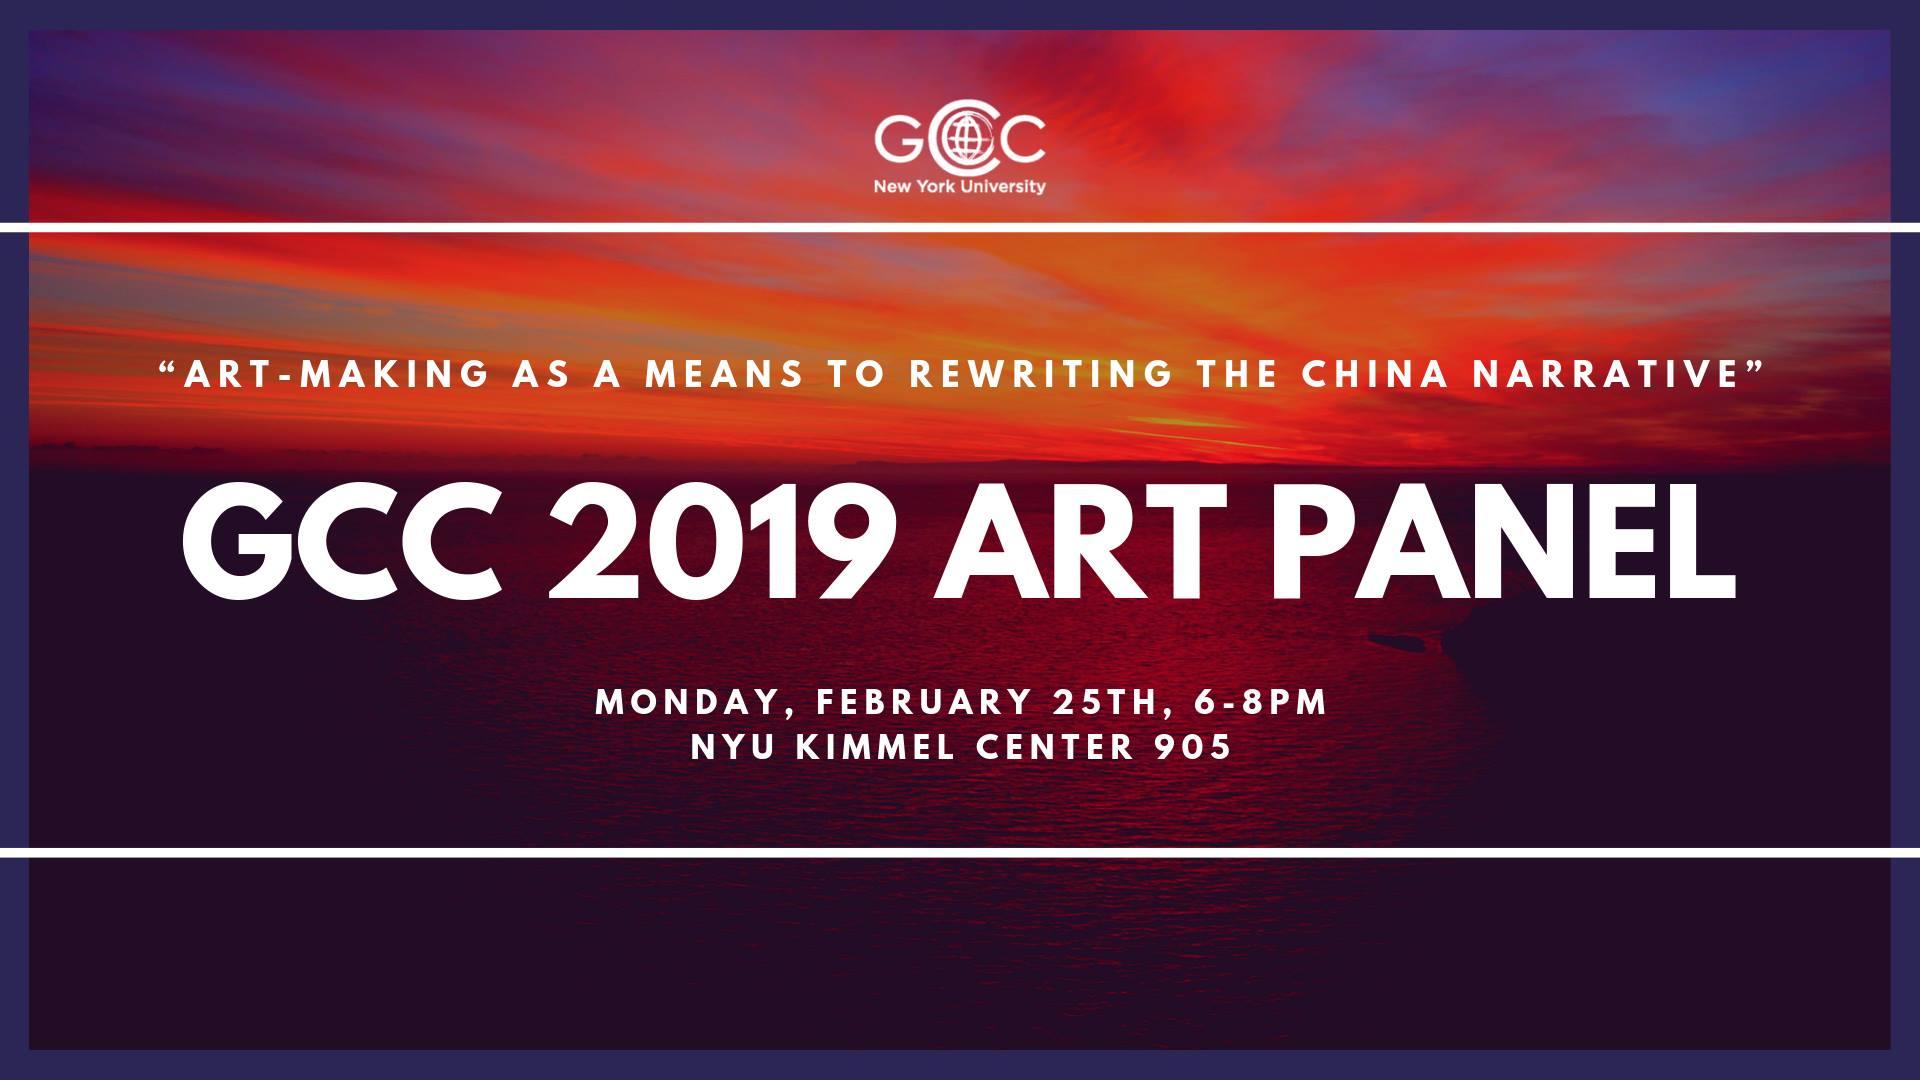 GCC 2019 Art Panel.jpg